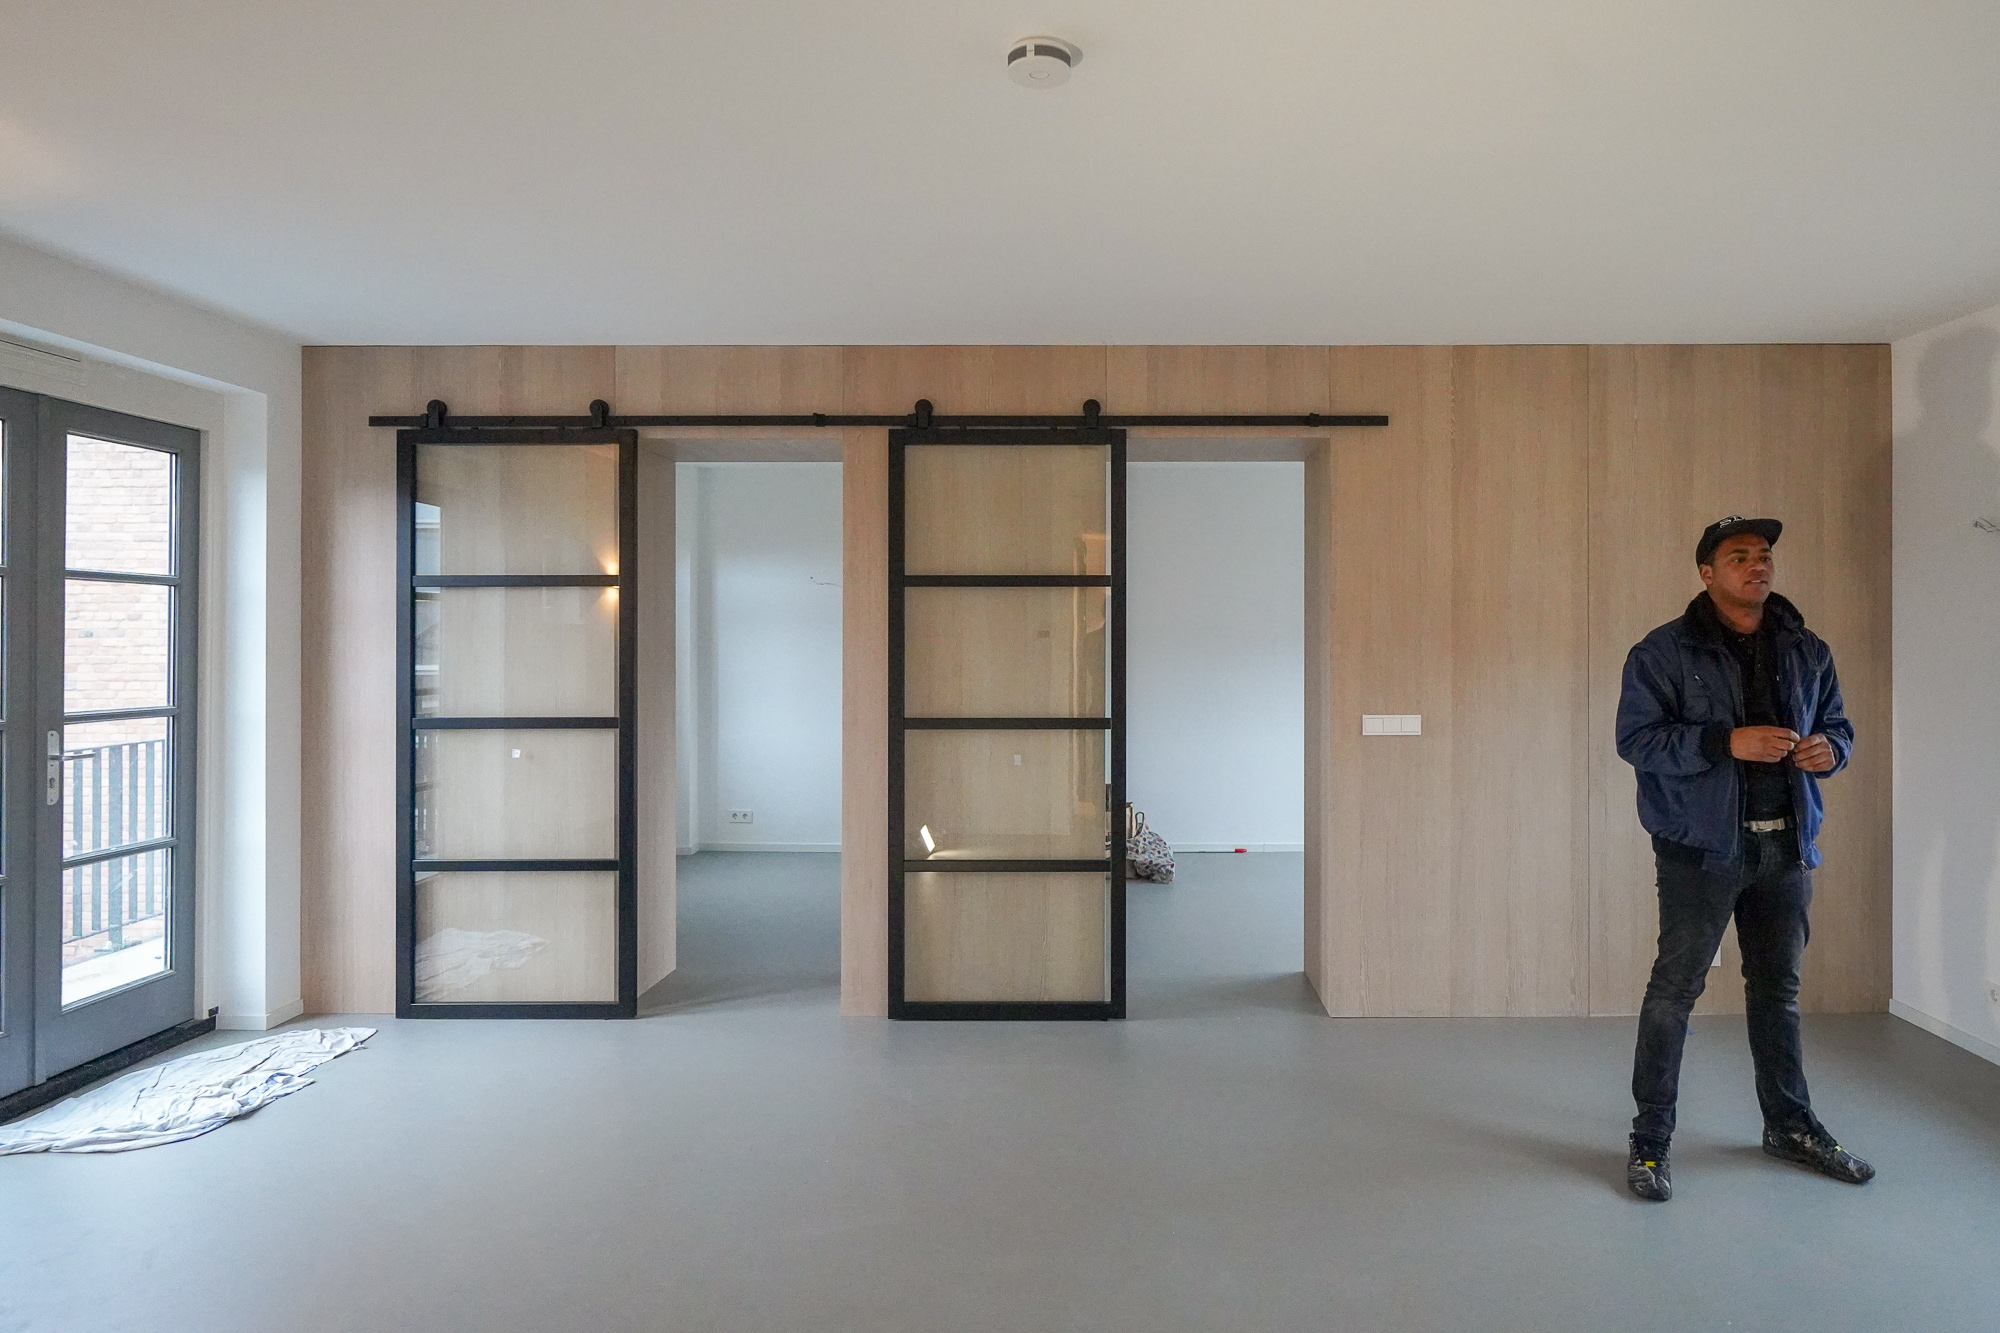 architectuur loft rotterdam interieur